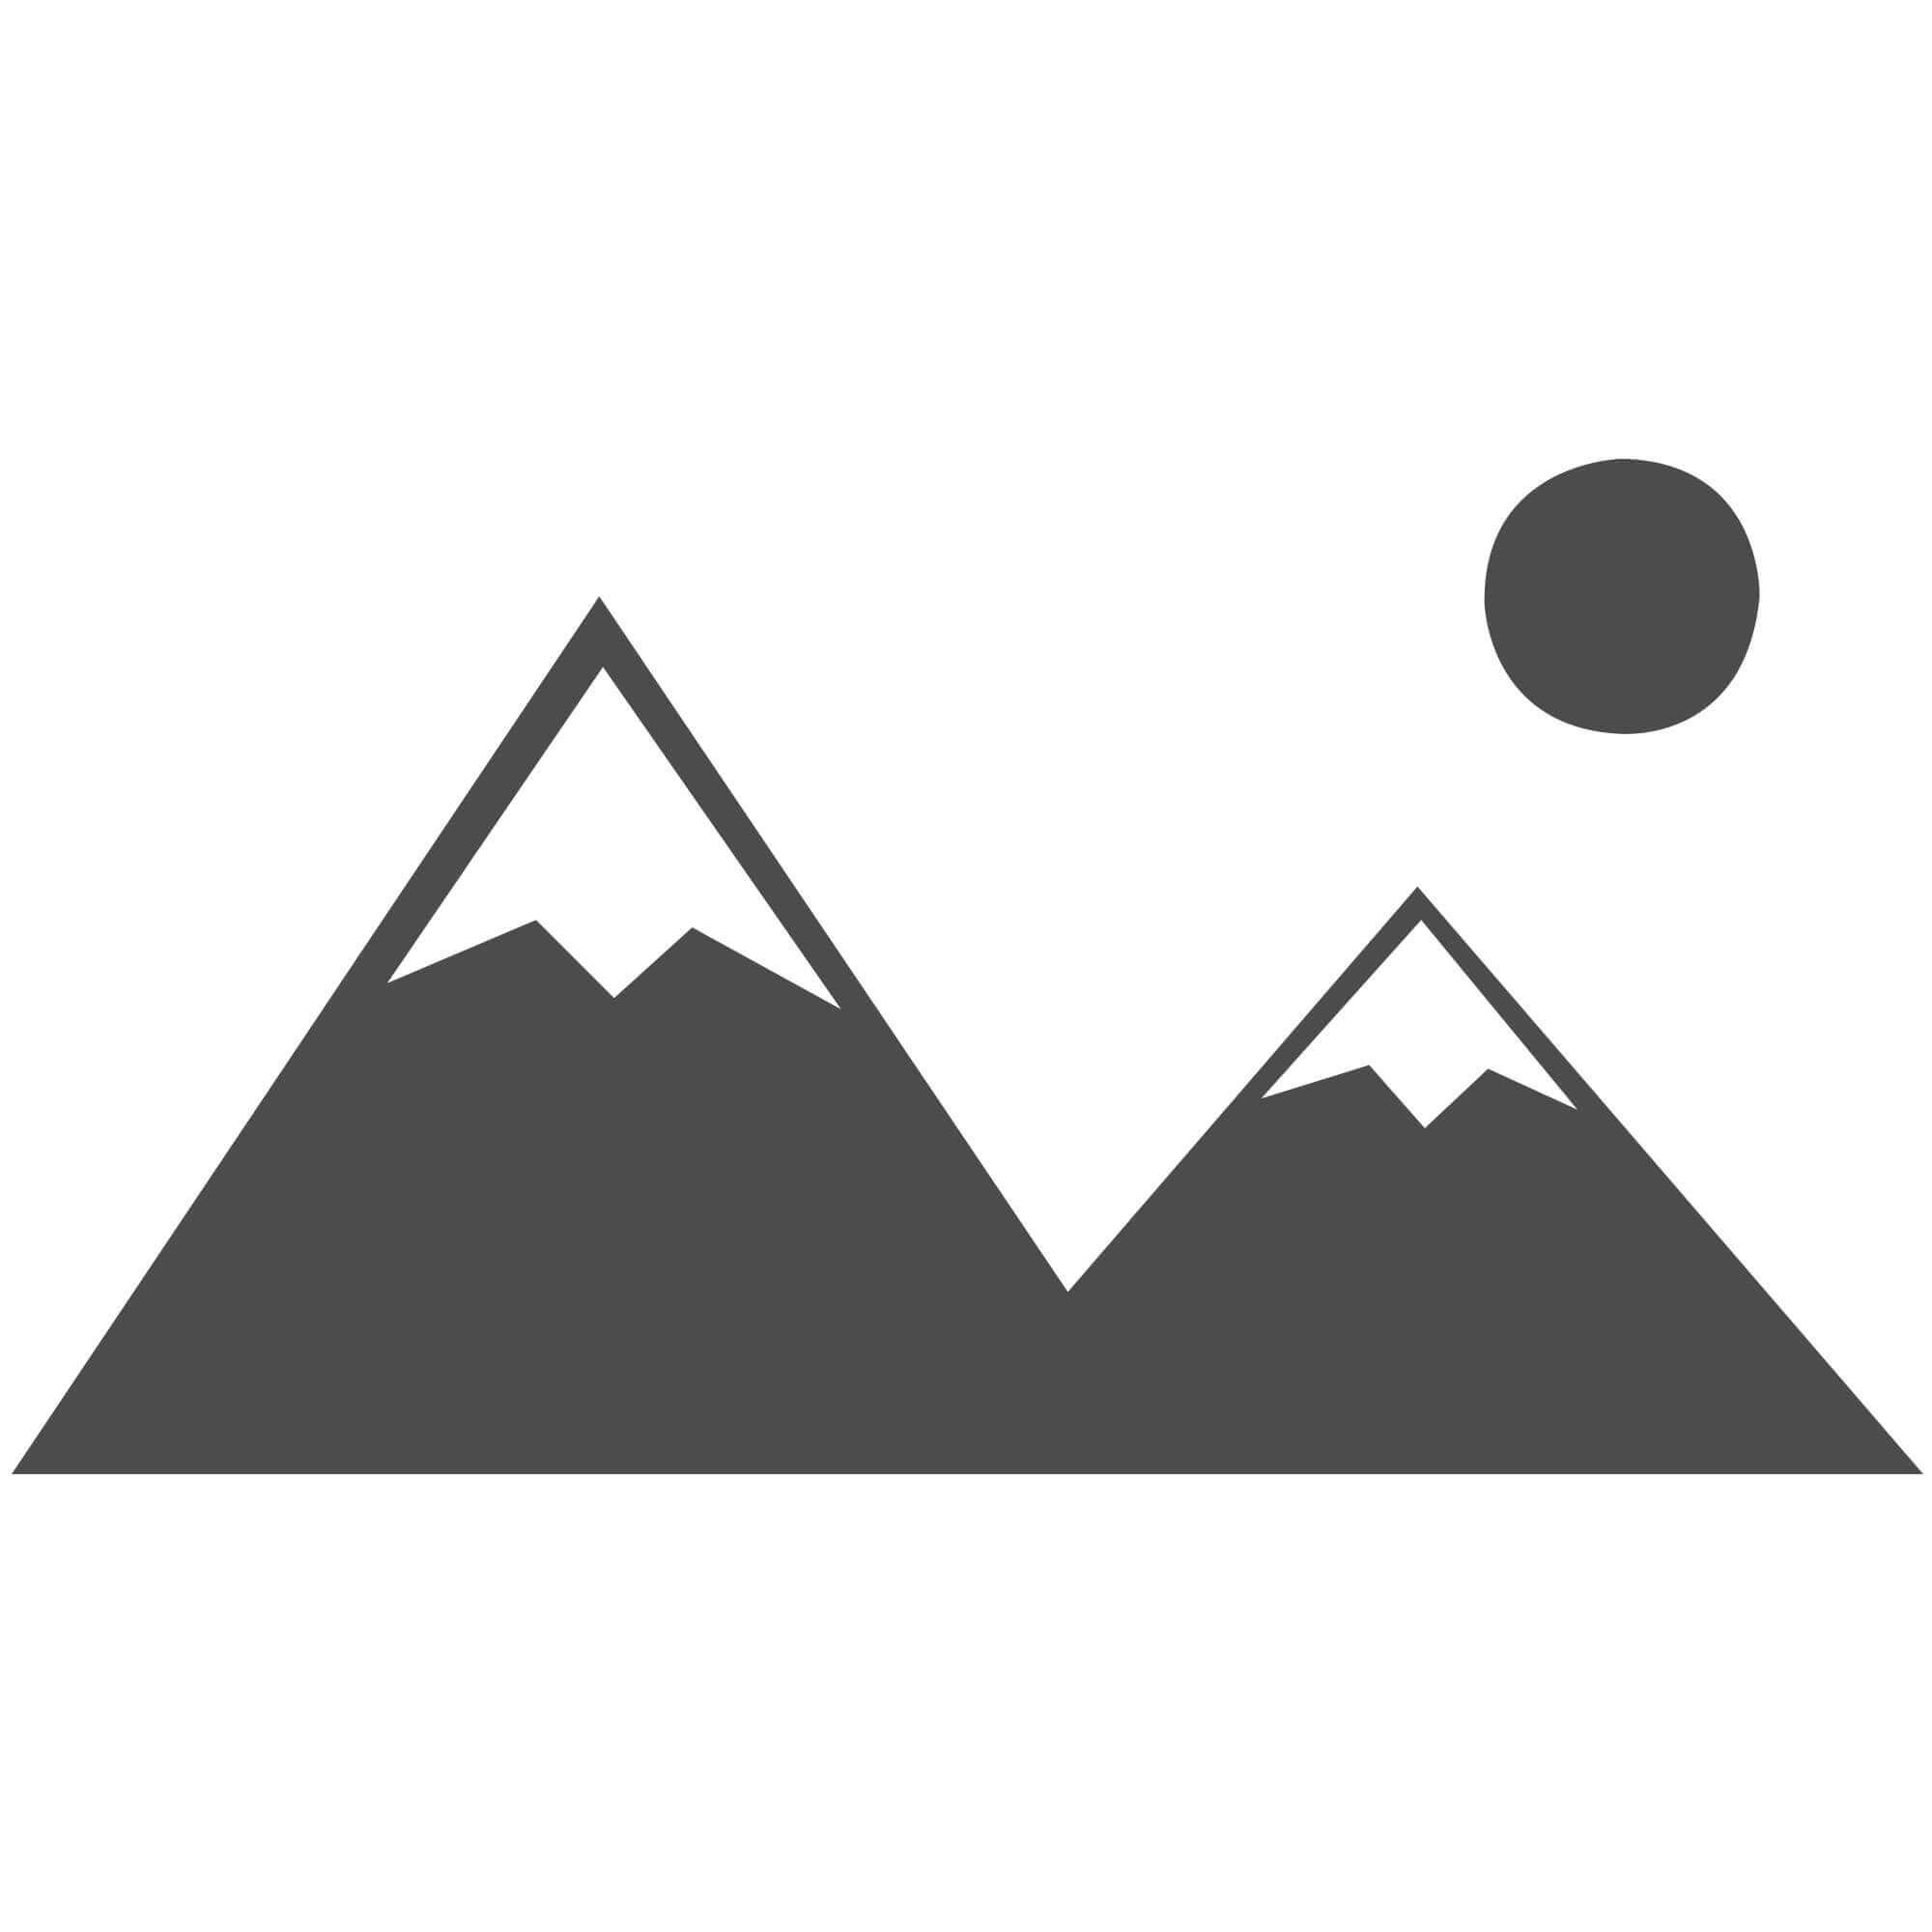 "Verge Furrow Pink Rug - Size 120 x 170 cm (4' x 5'7"")"